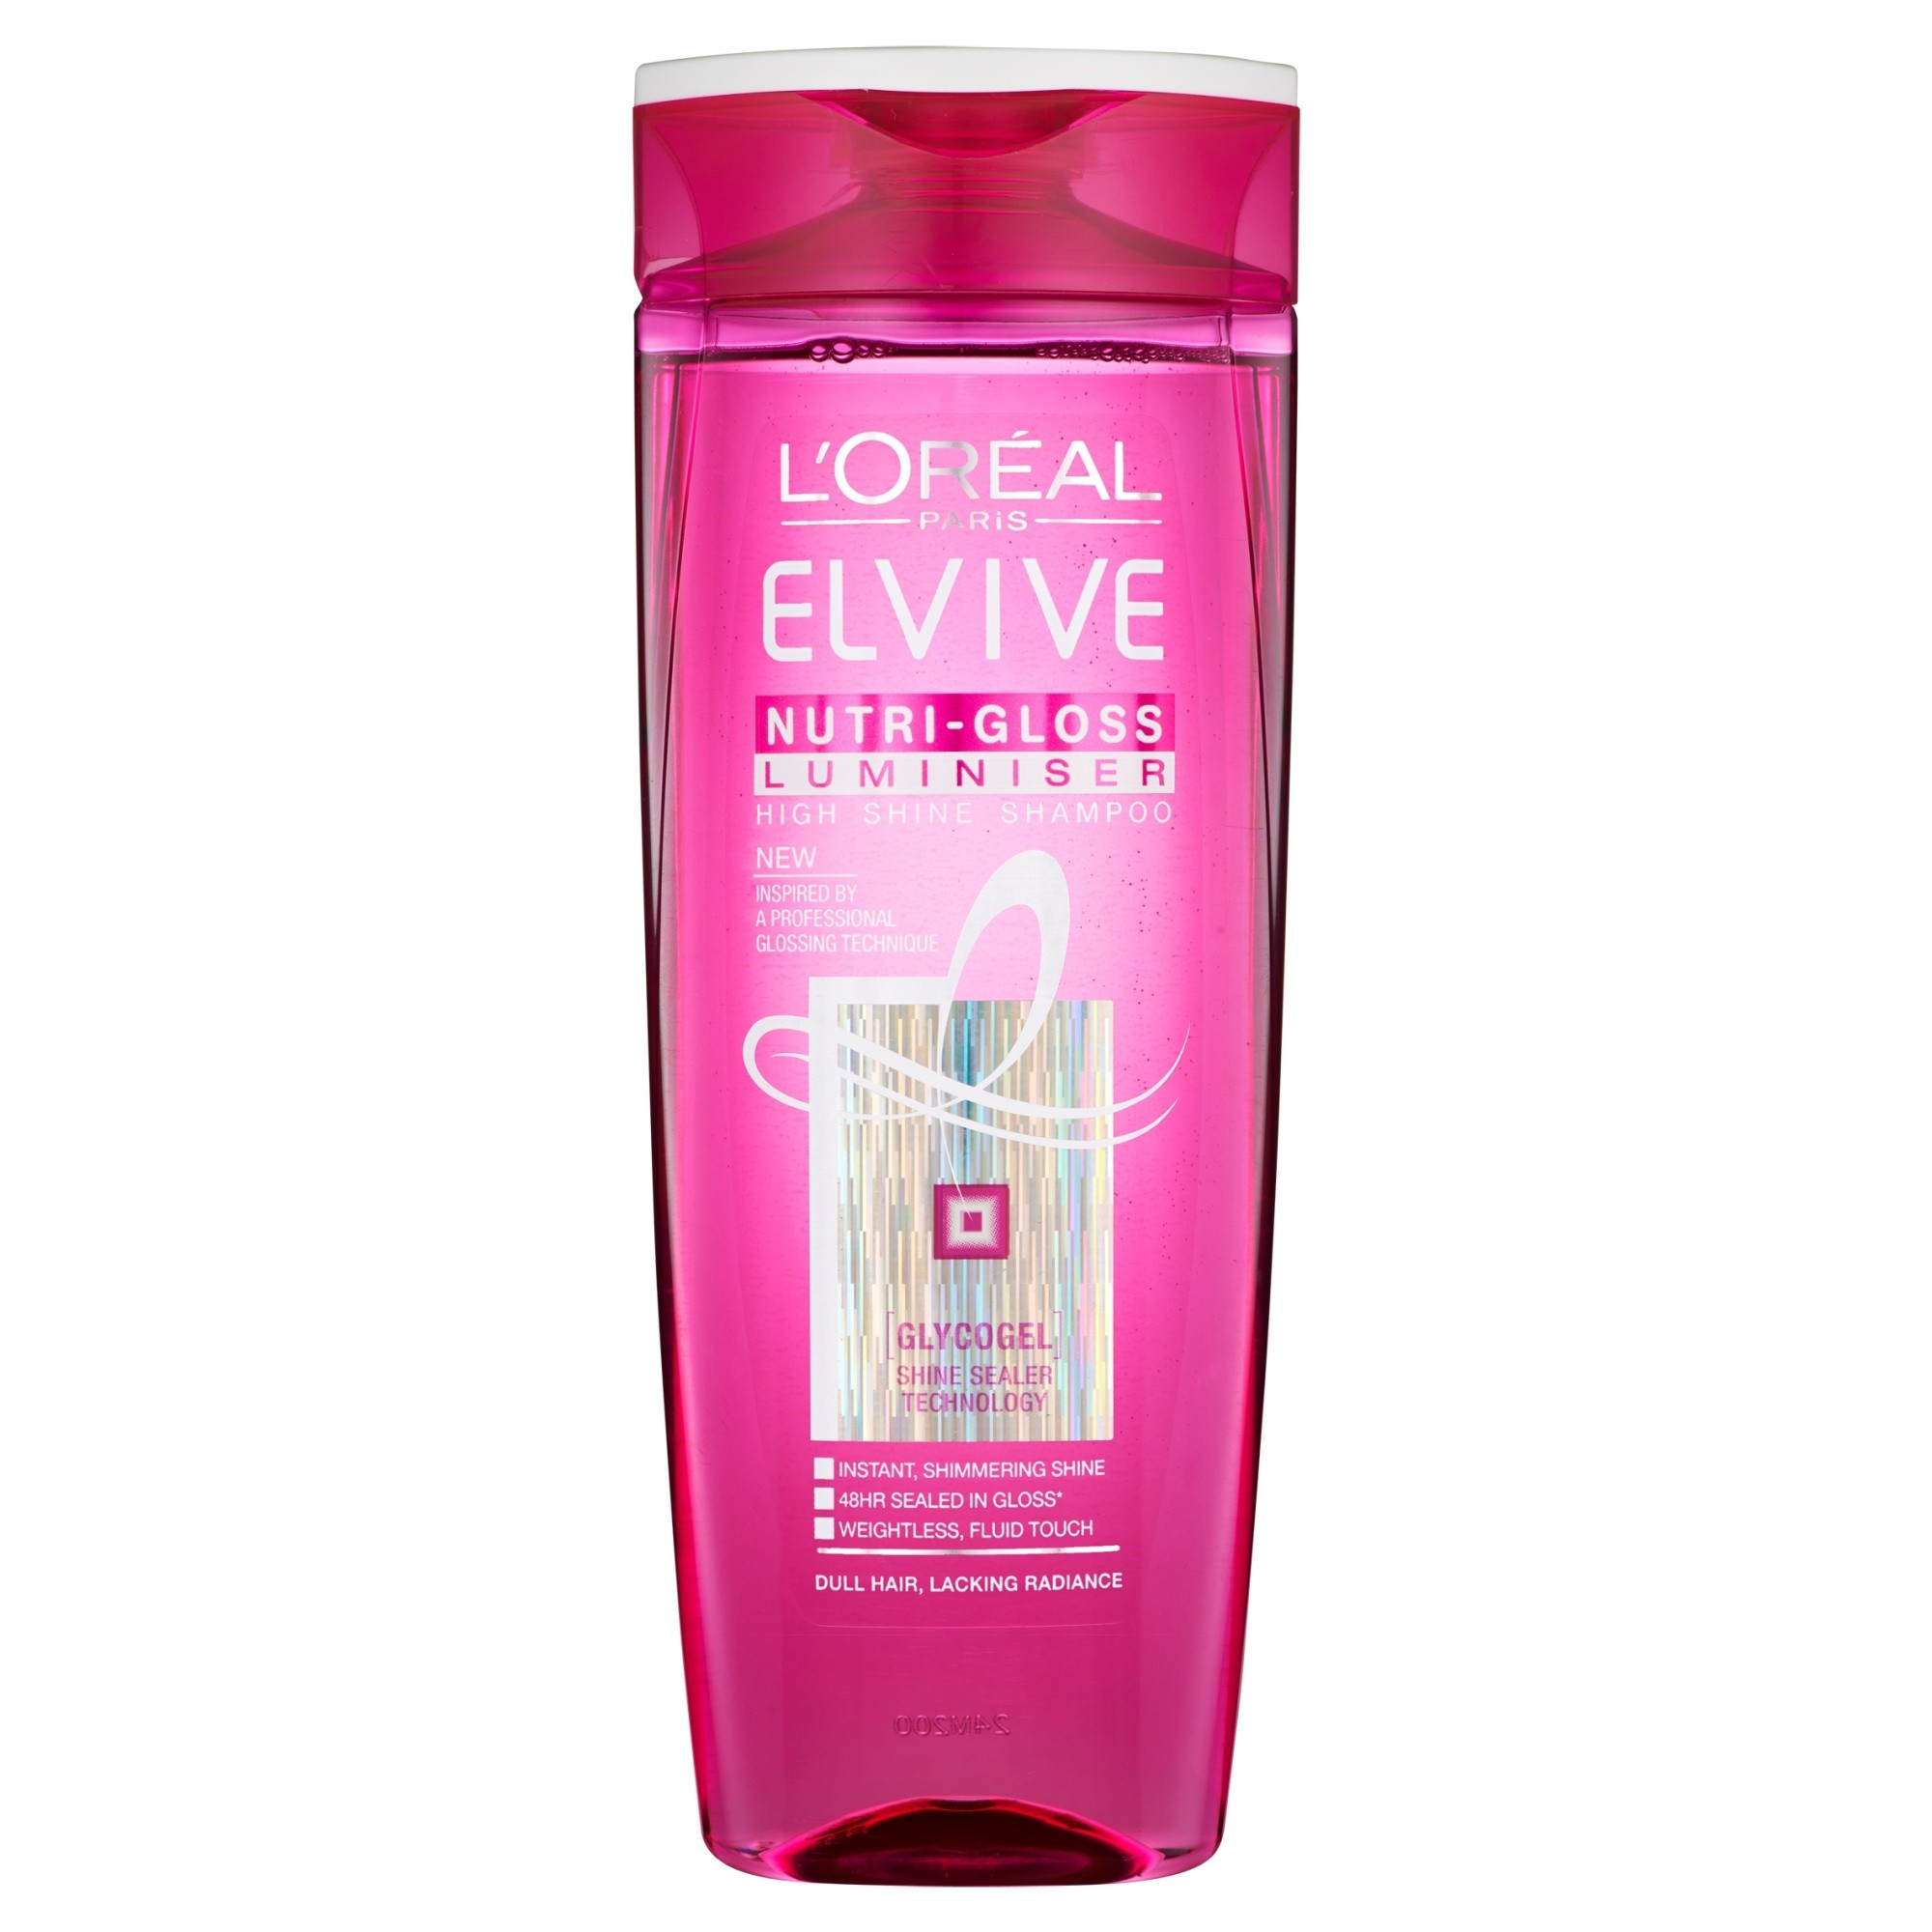 L'Oreal Paris Nutri-Gloss Luminiser High Shine Shampoo